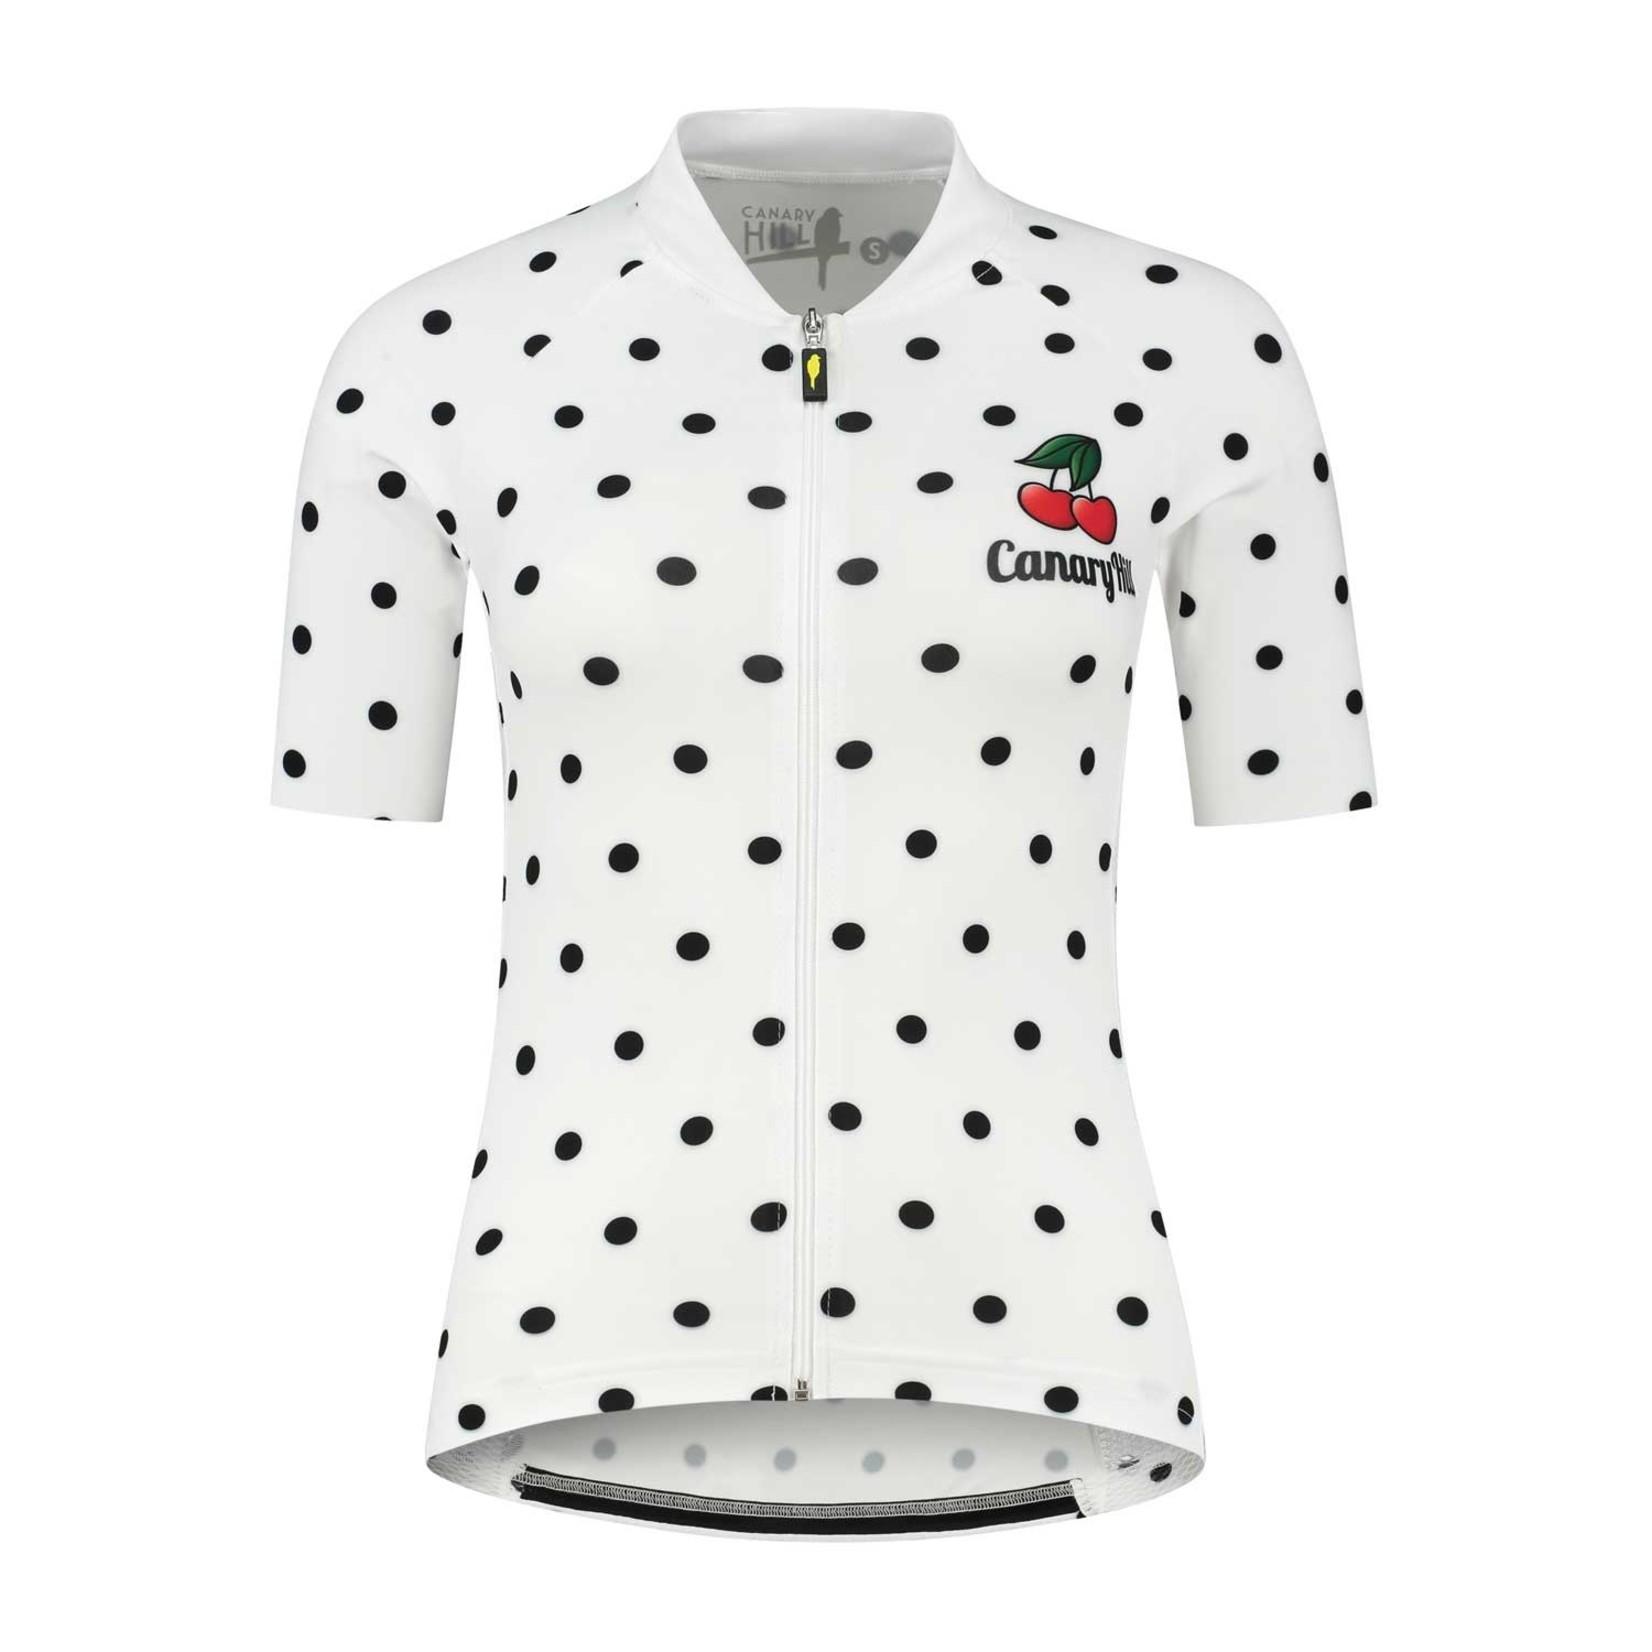 Canary Hill 'Chérie' Shirt